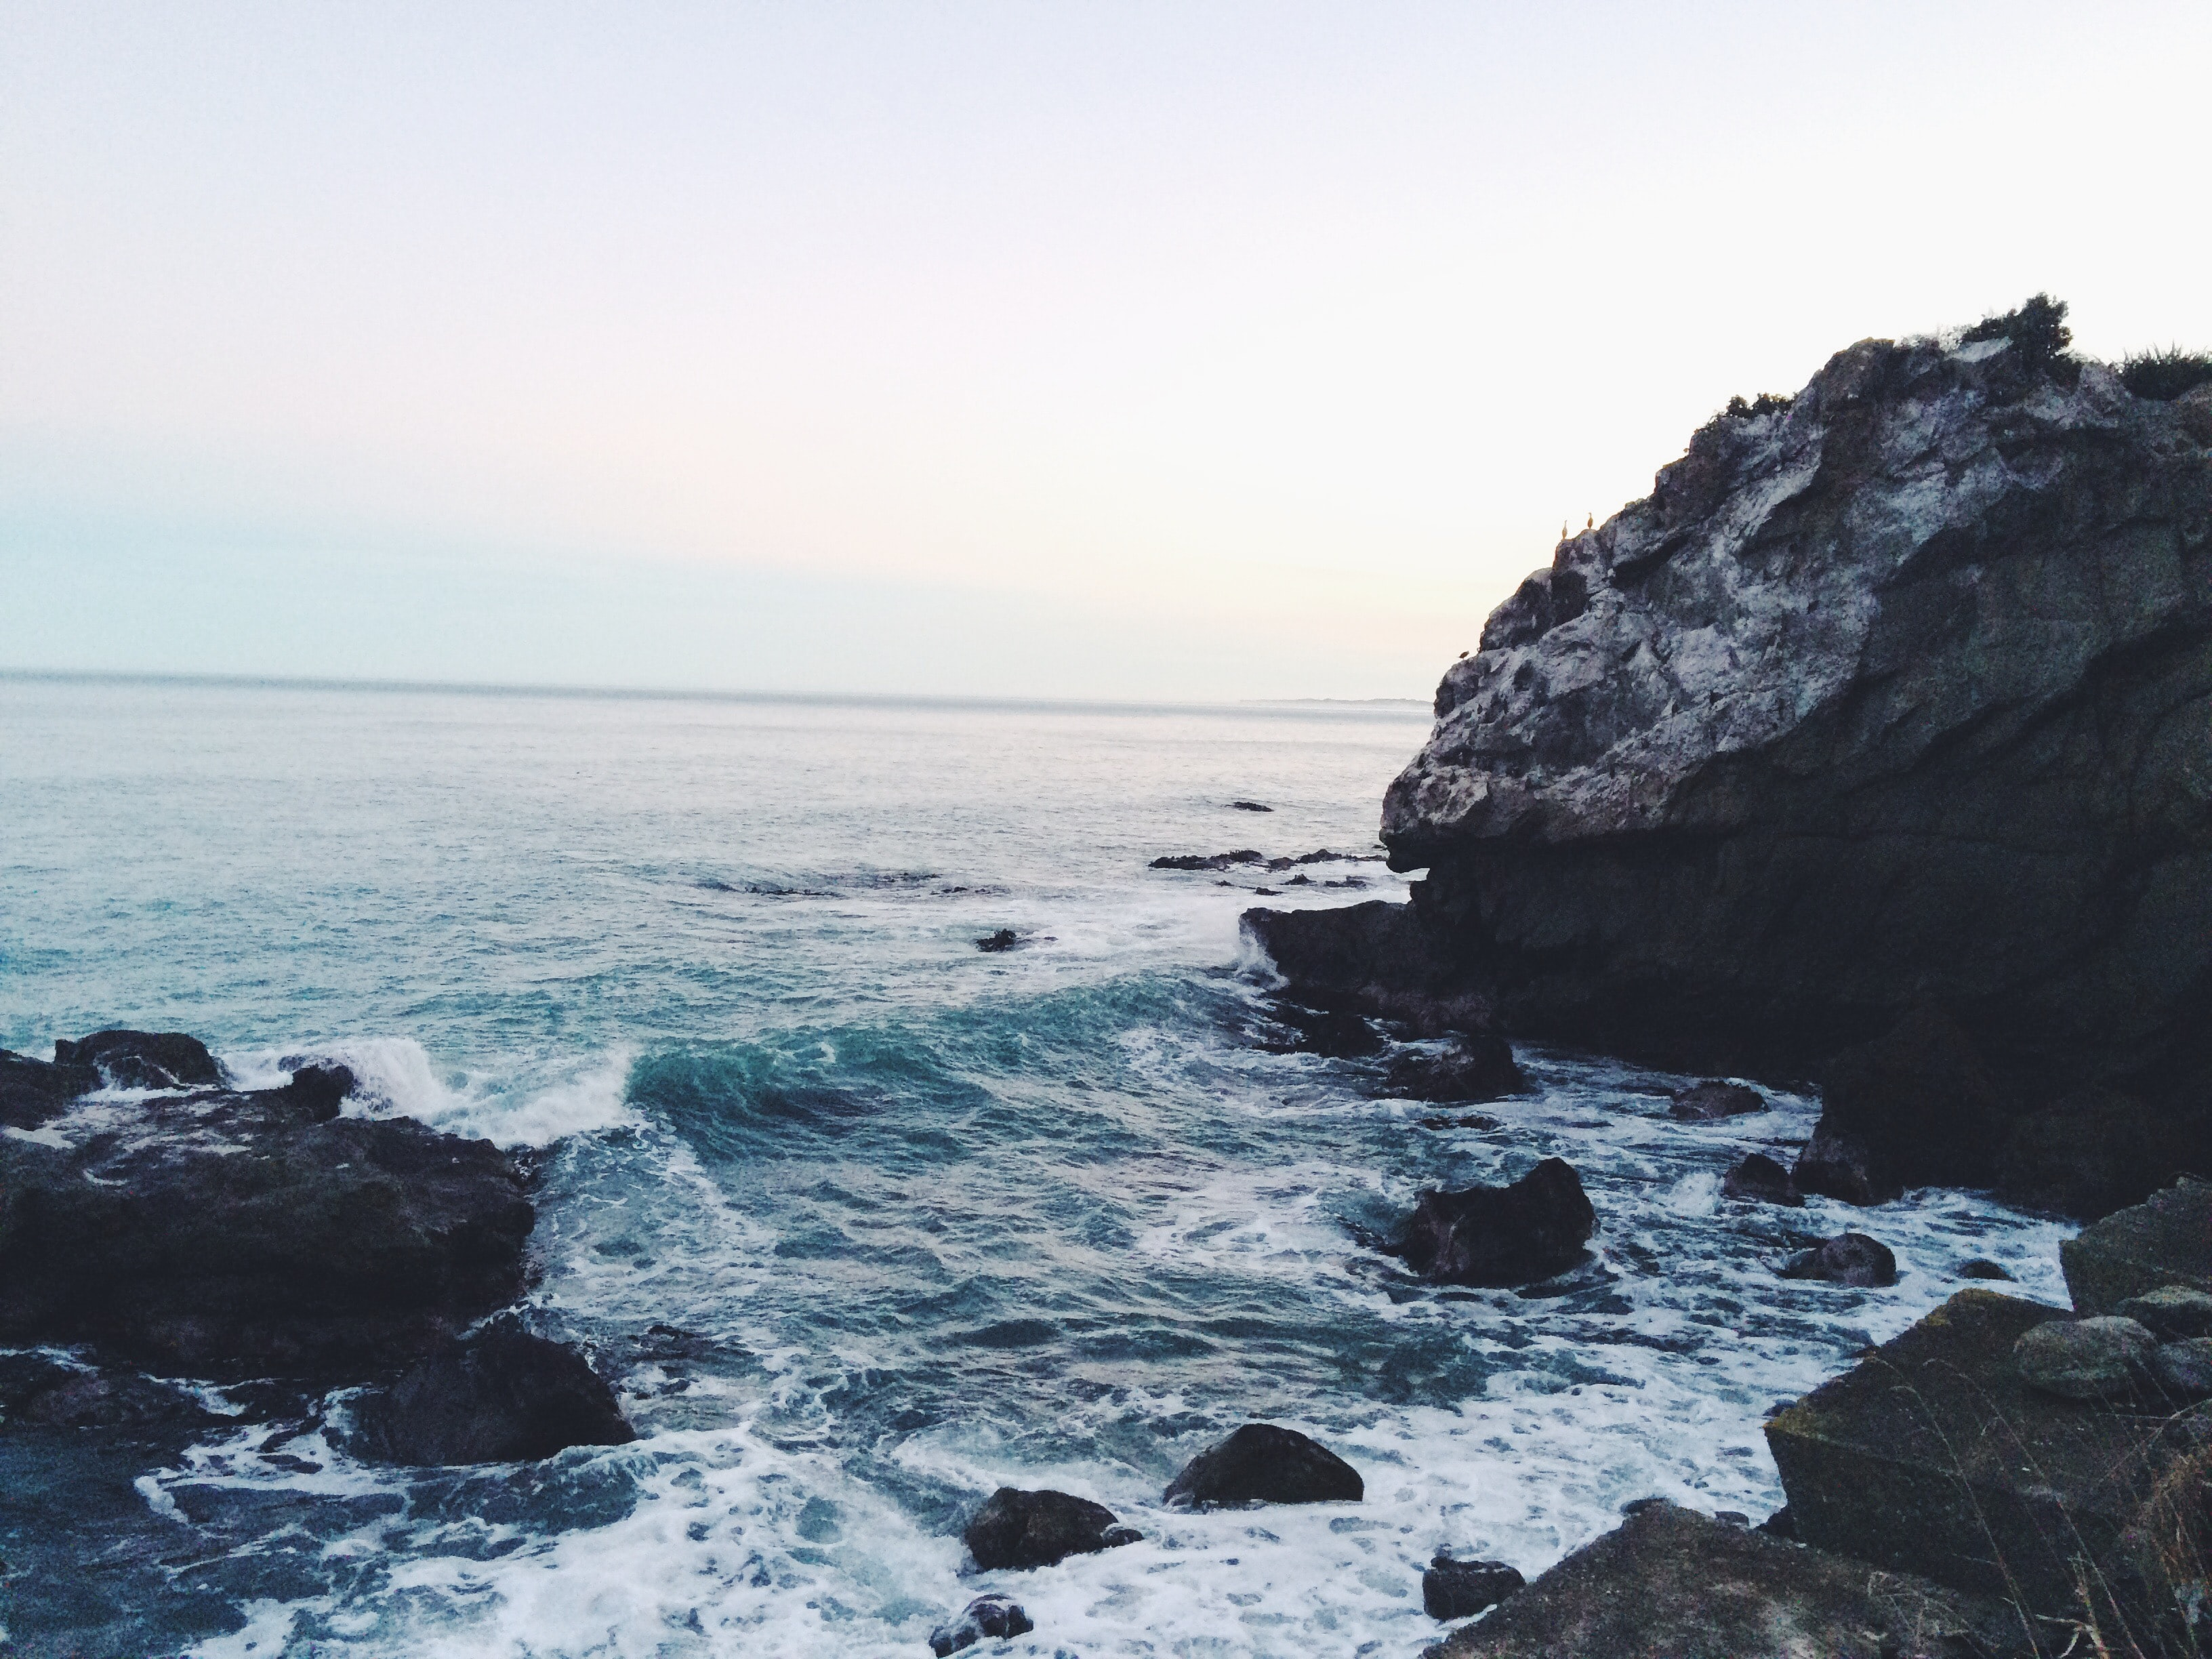 ocean waves near rocks during daytime